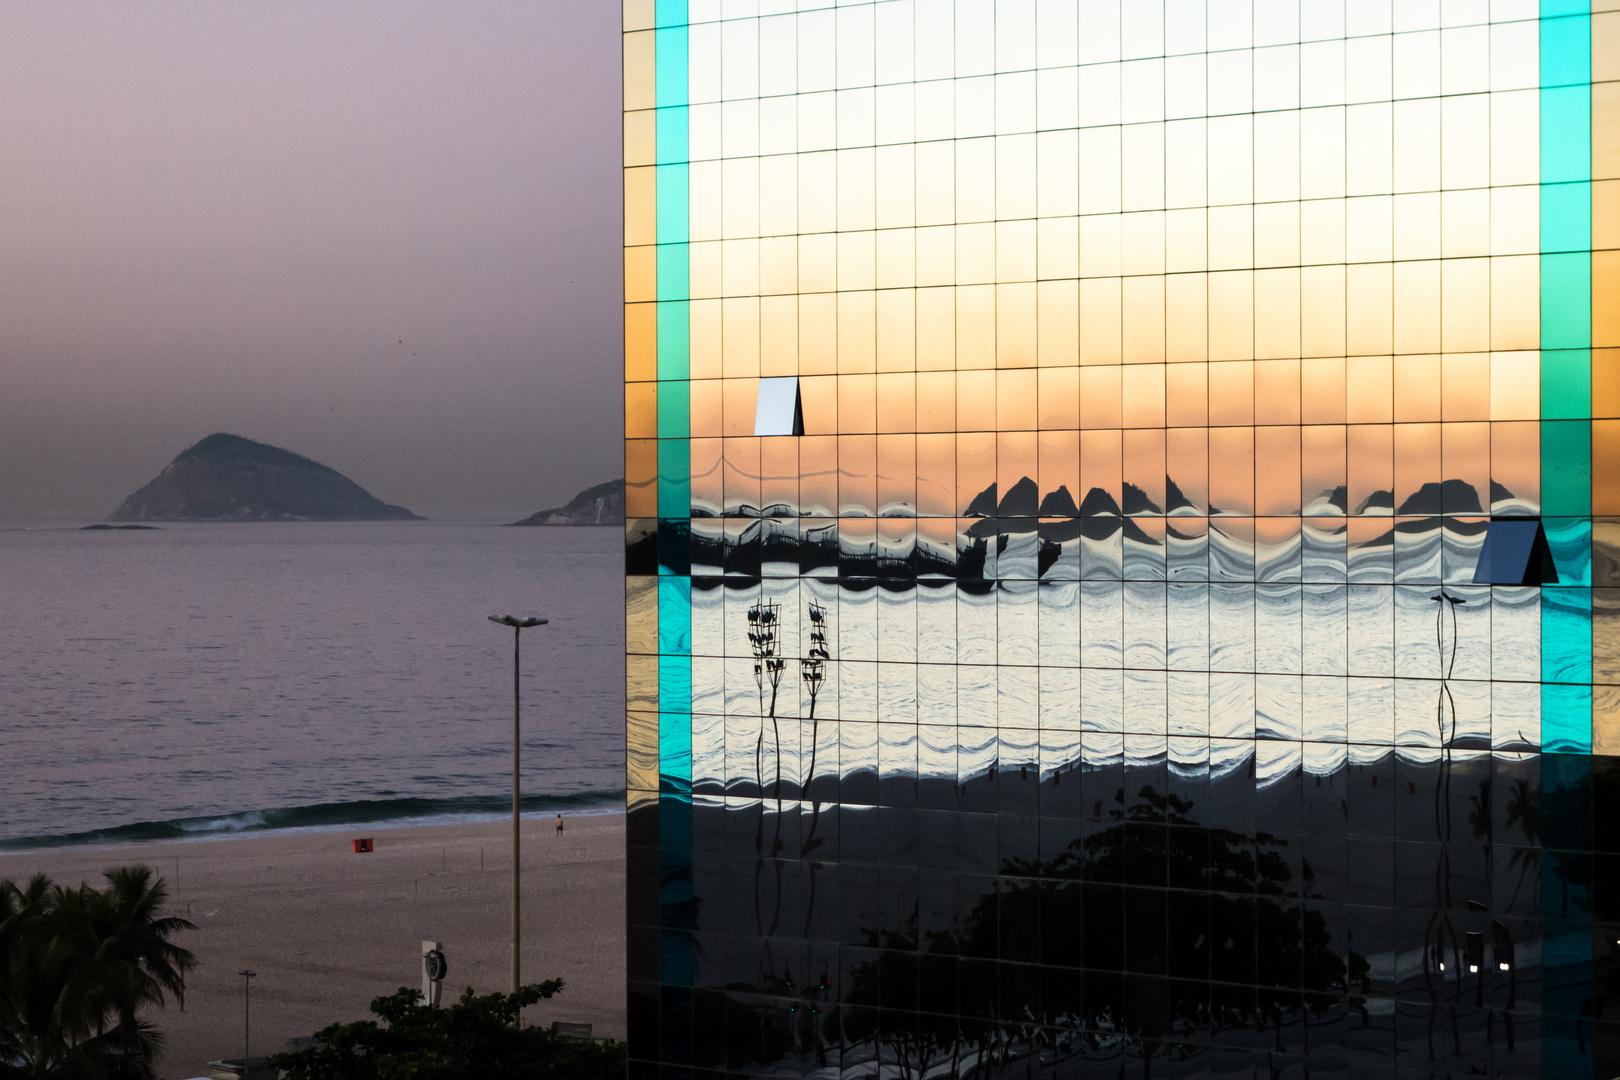 Sunrise Copacabana